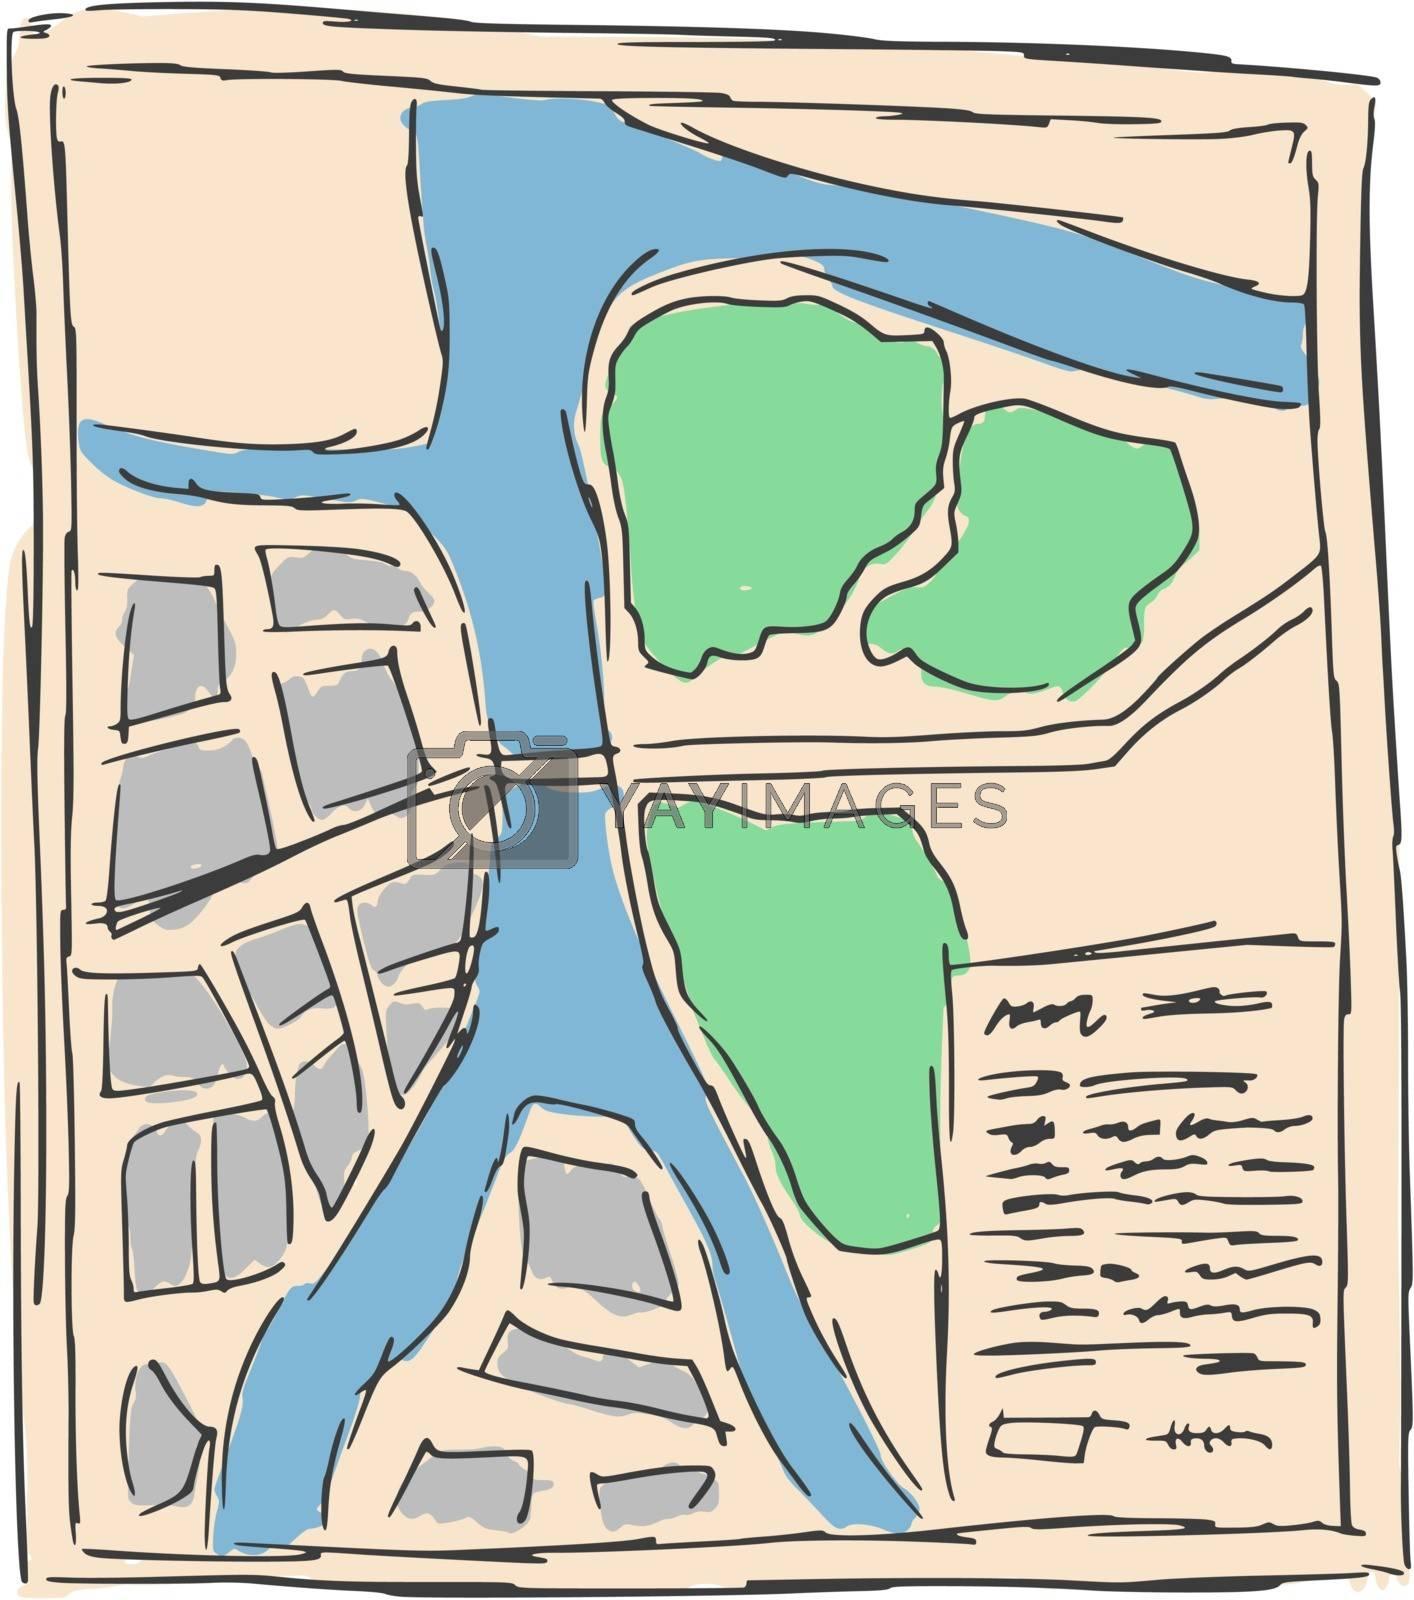 hand drawn, sketch, cartoon illustration of map